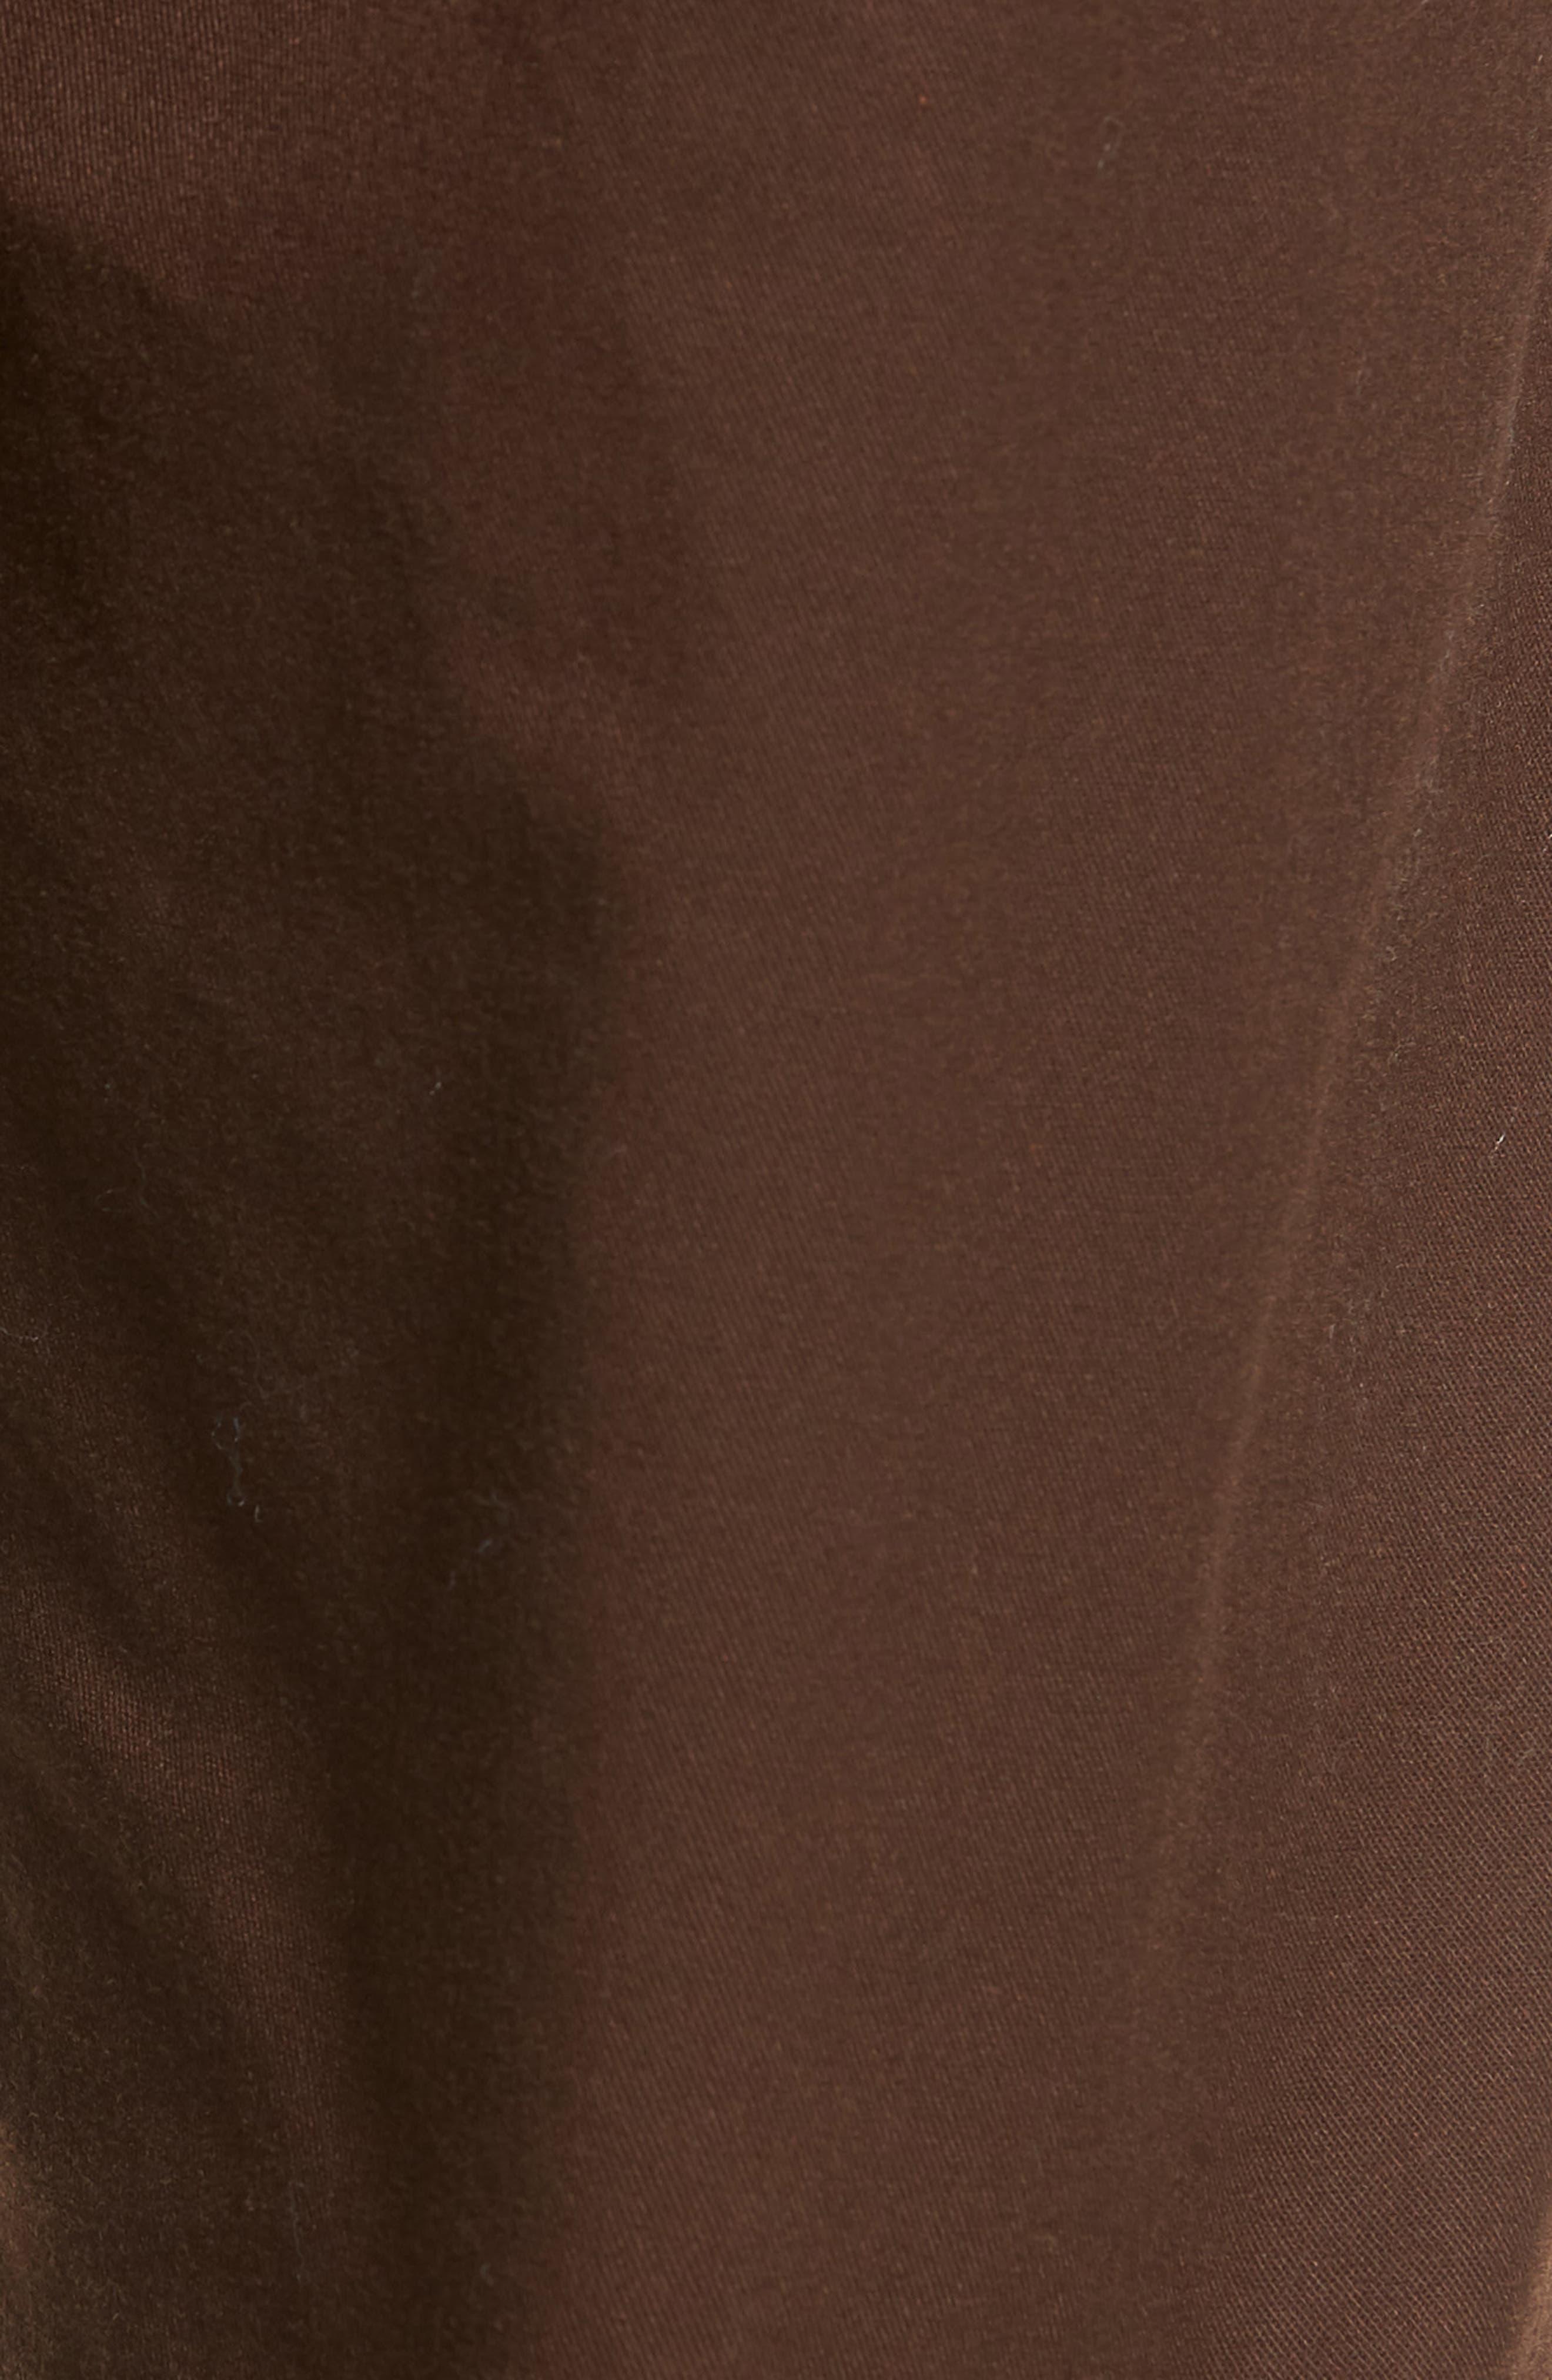 Authentic Chino Pro Pants,                             Alternate thumbnail 5, color,                             DEMITASSE